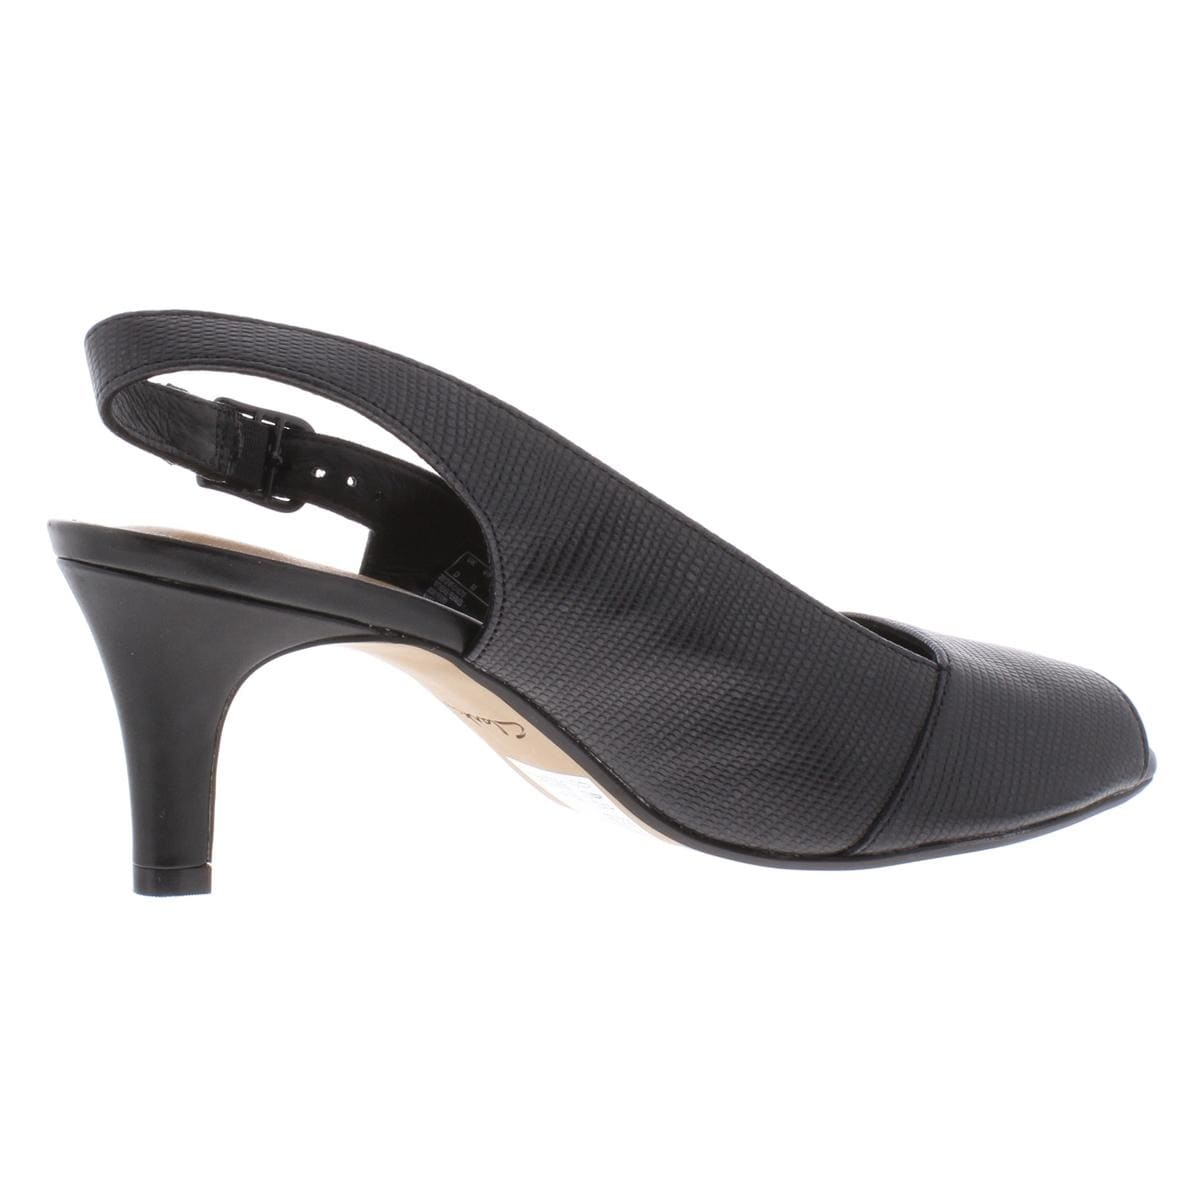 Clarks Womens Heavenly Leah Slingback Heels Faux Leather Peep Toe